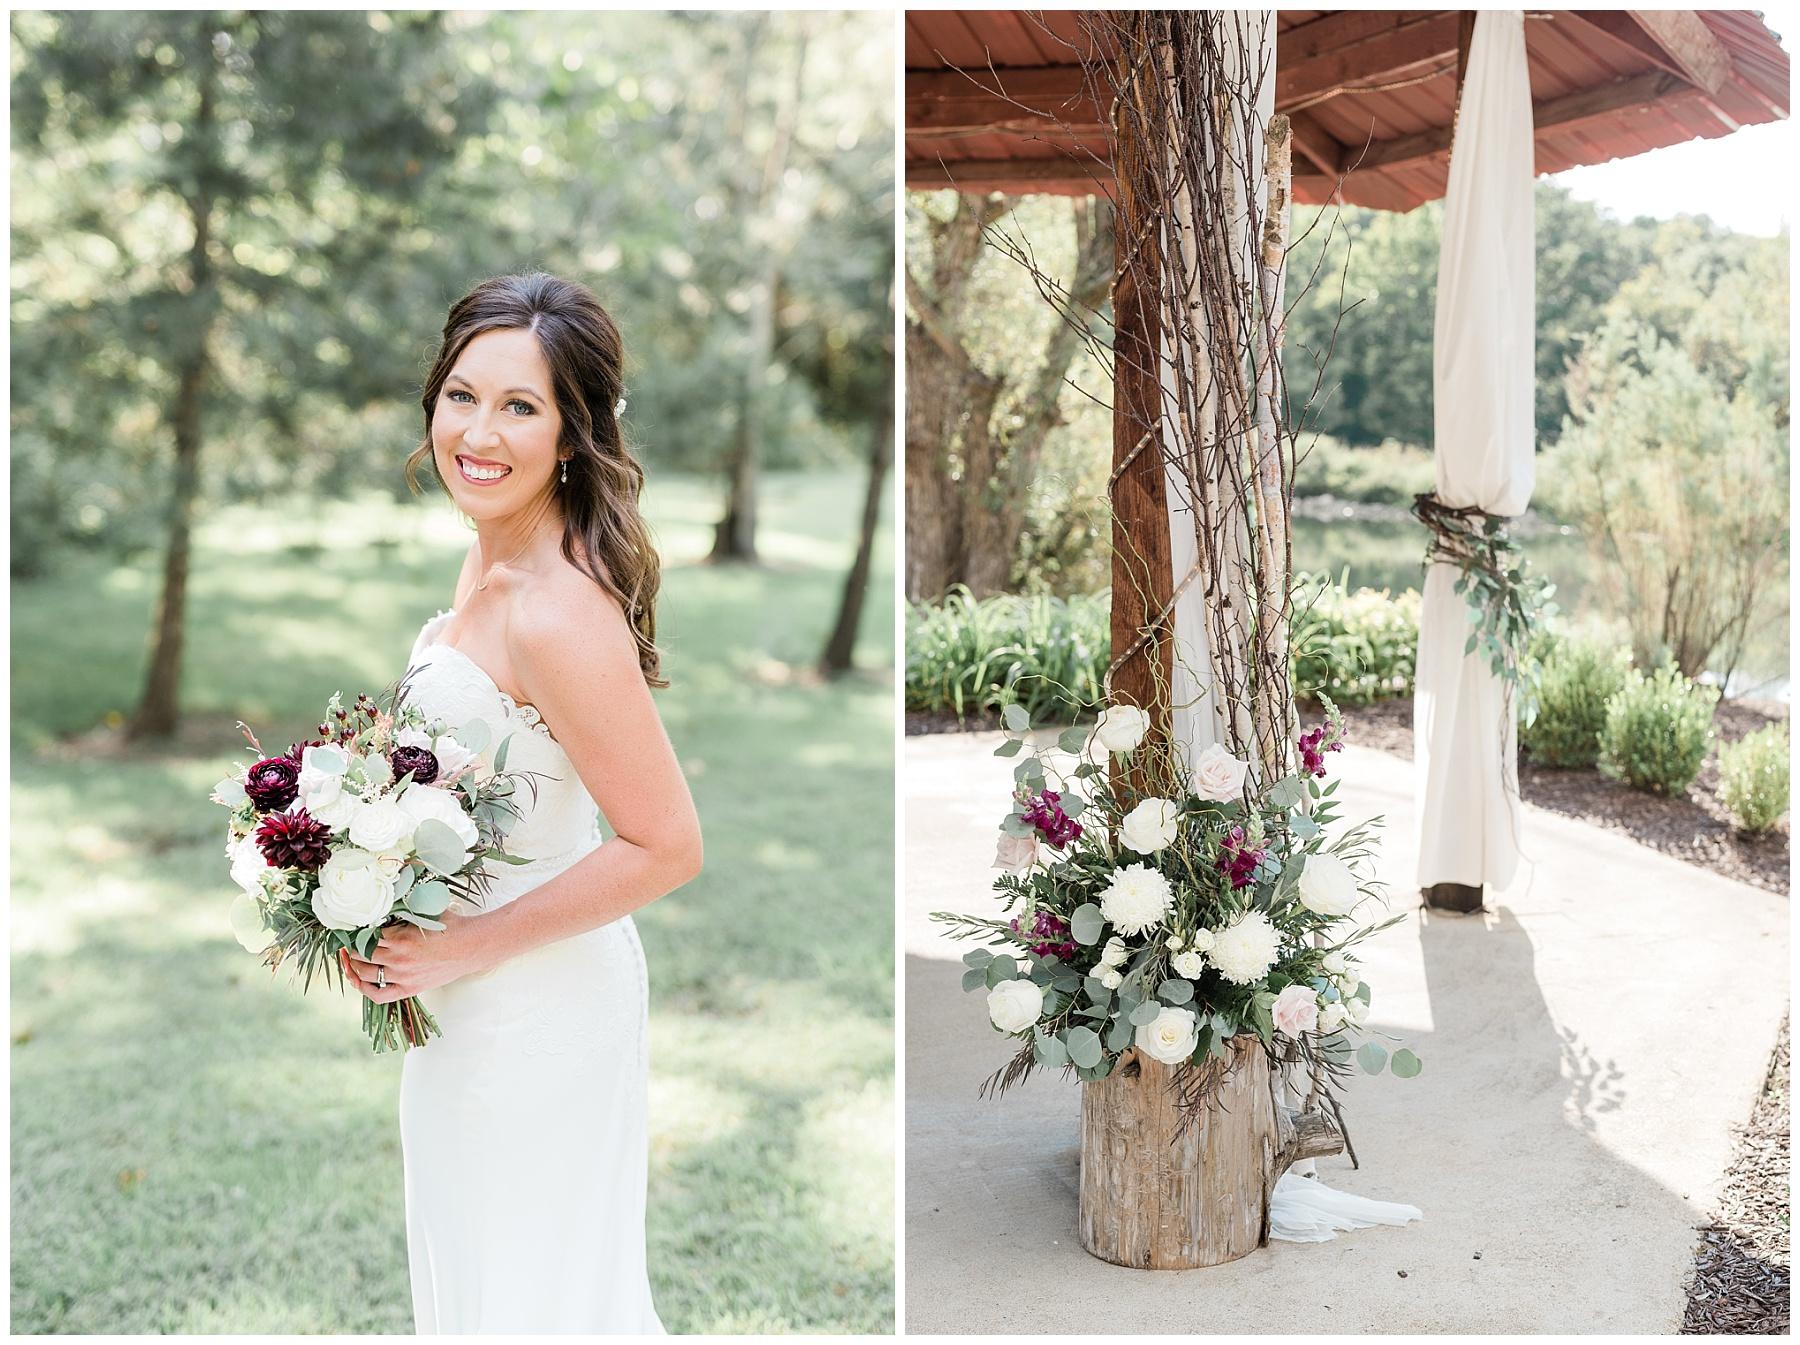 Romantic Summer Sunset Wedding Ceremony at Little Piney Lodge St. Louis Missouri by Kelsi Kliethermes Photography Fine Art Photographer_0040.jpg